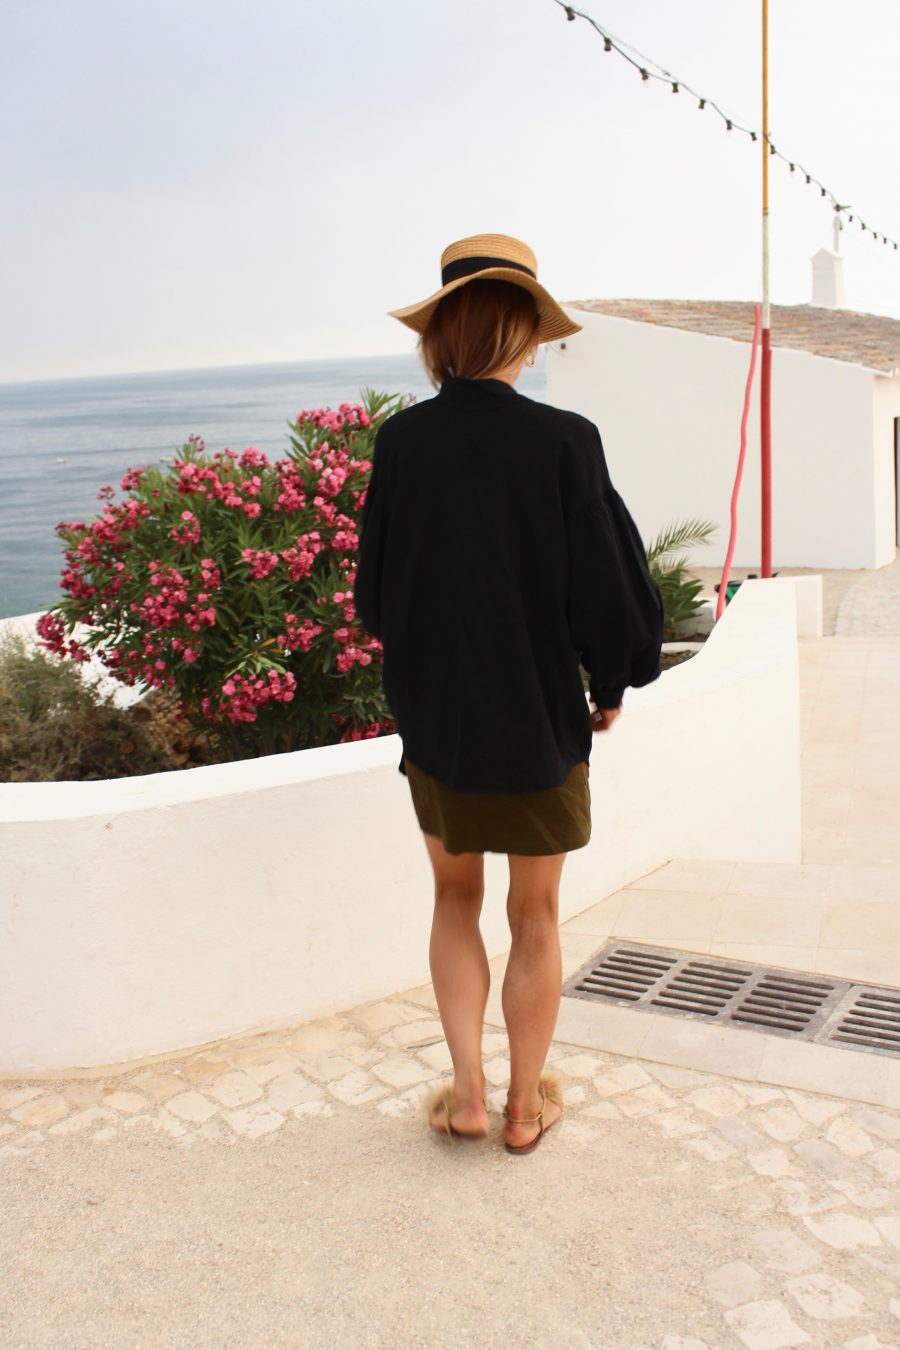 Linen Bluse Zara summer 2018